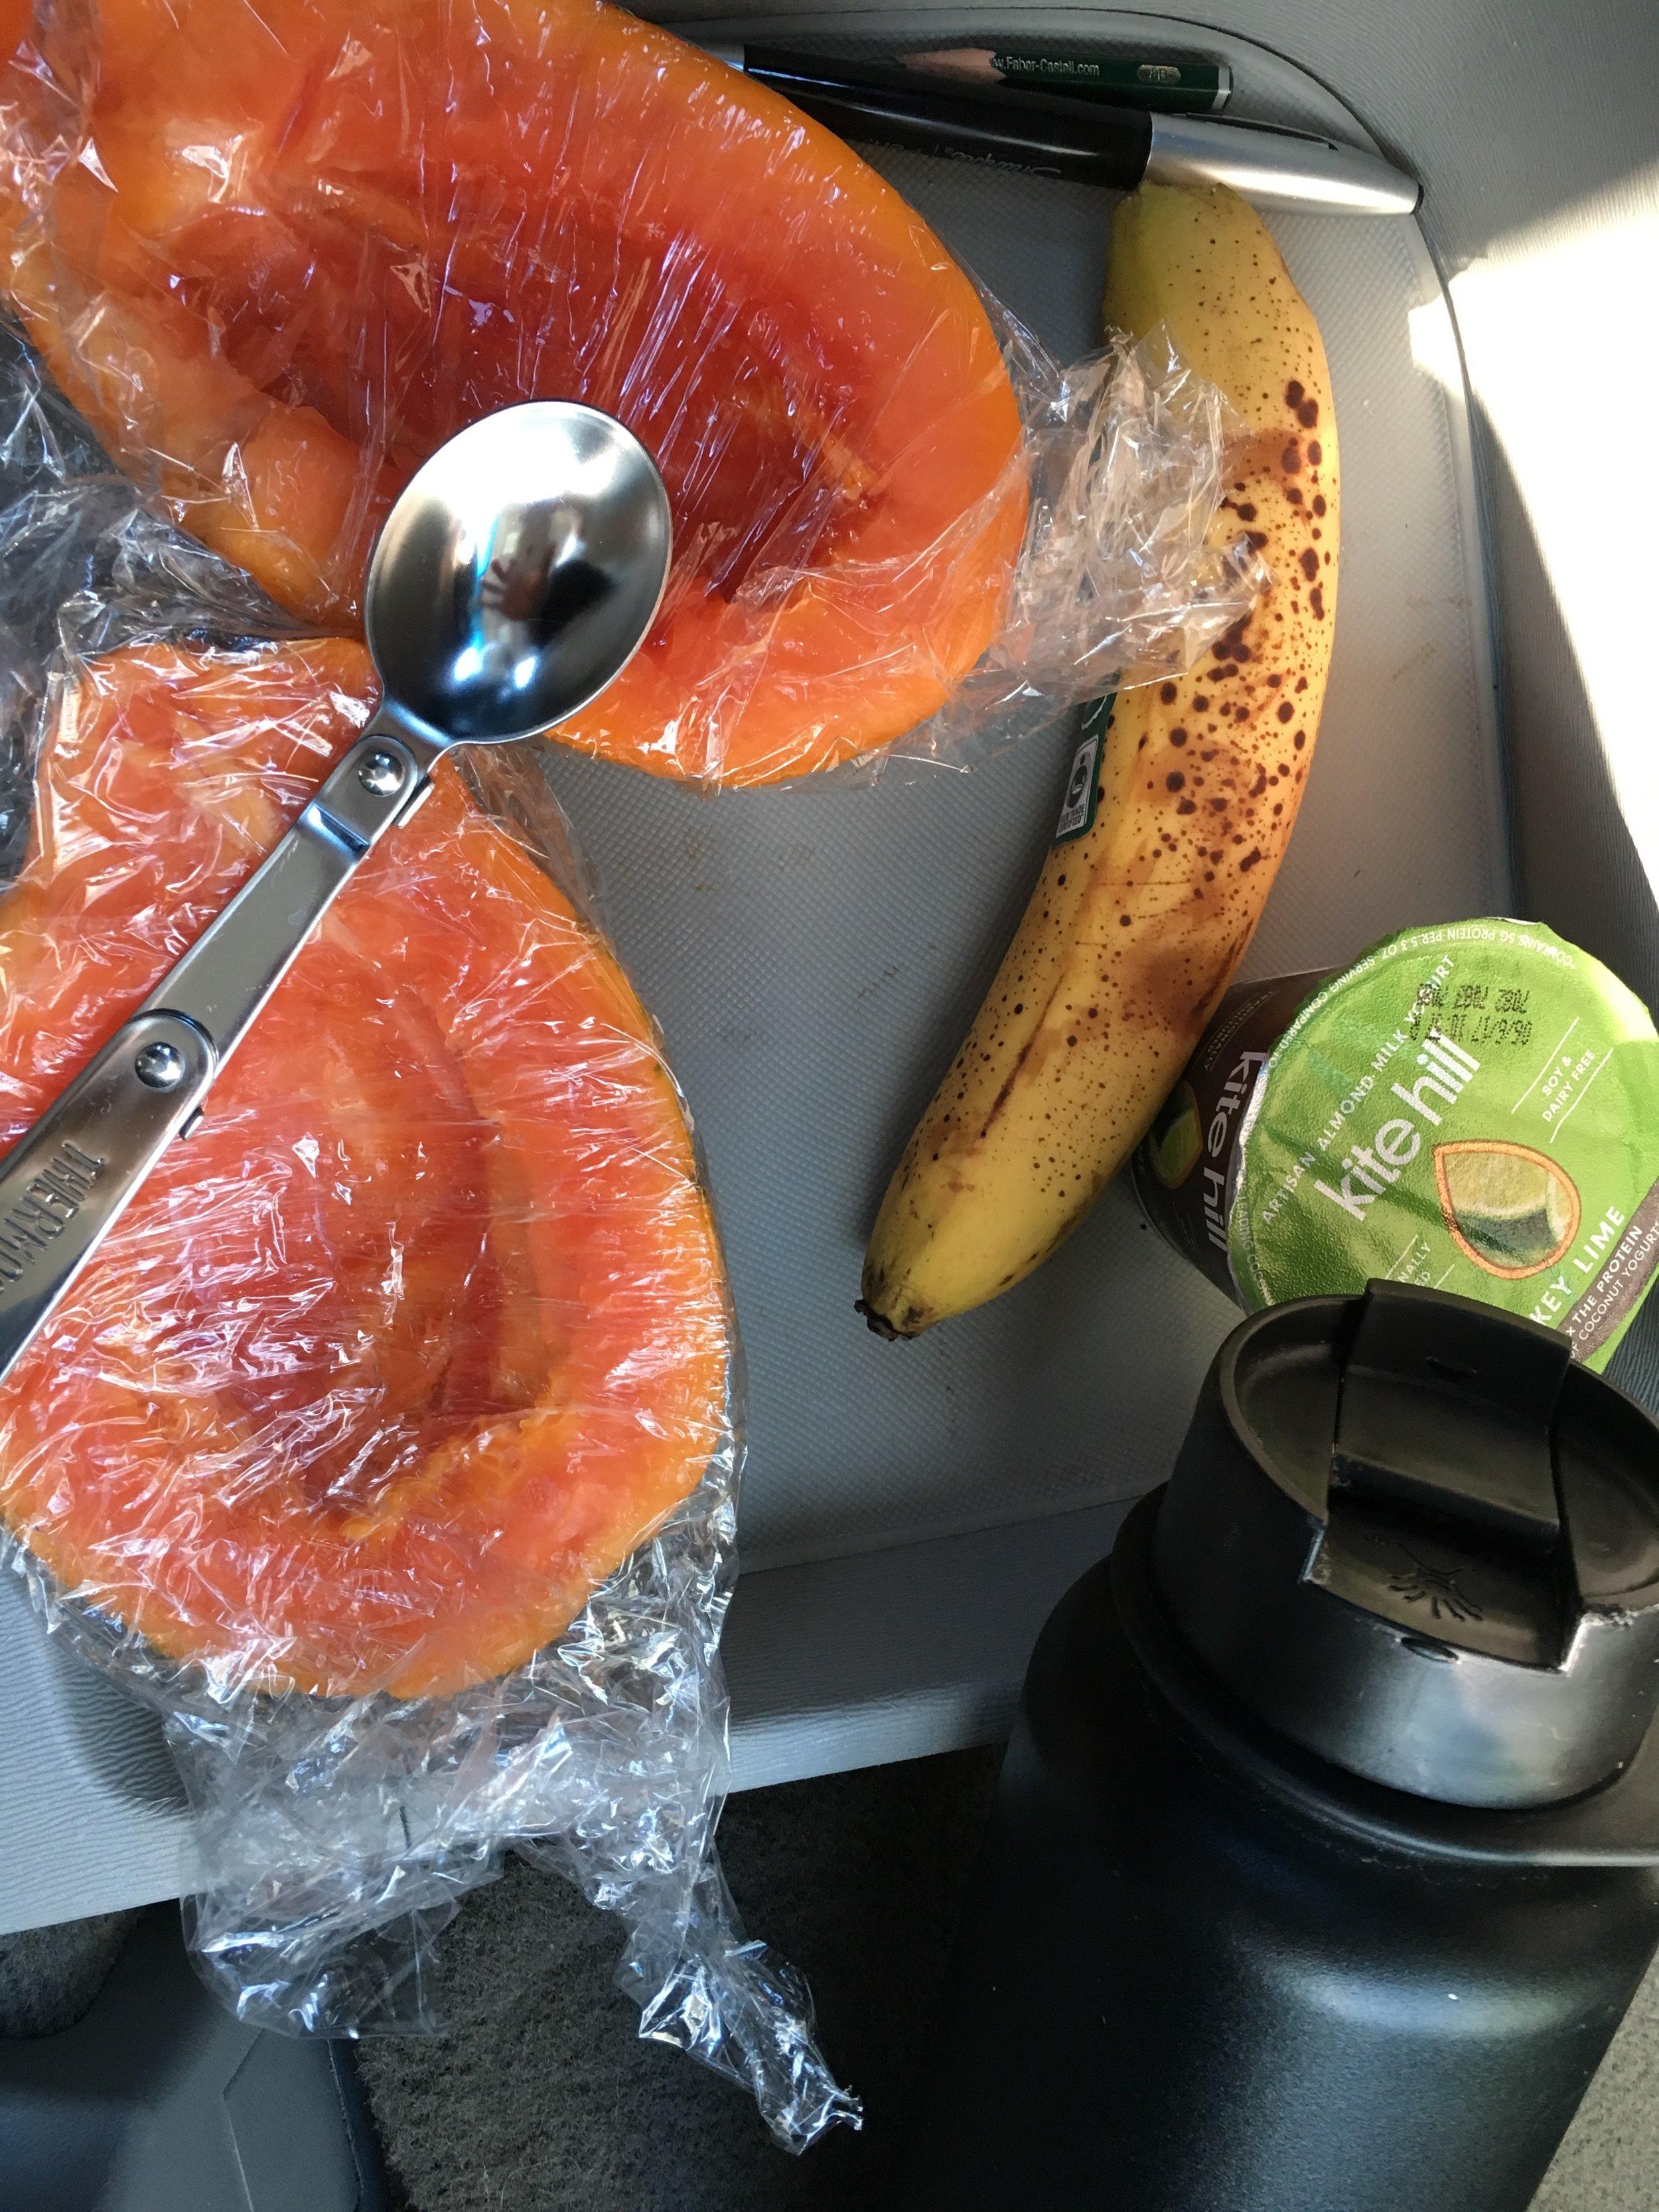 Breakfast on the go: organic papaya and banana with almond yogurt and water.